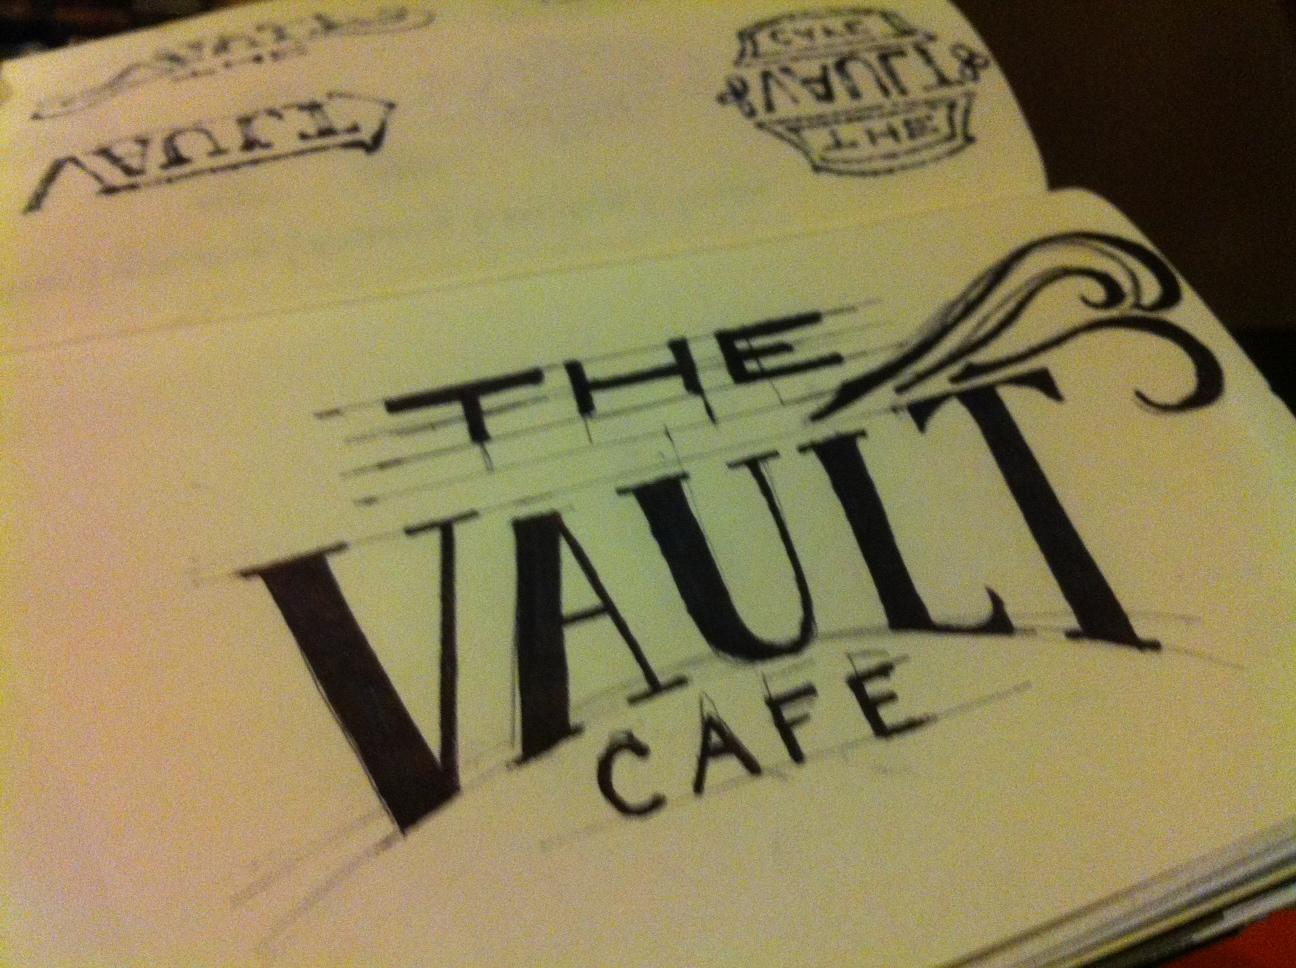 The Vault Cafe - Label Design - image 6 - student project